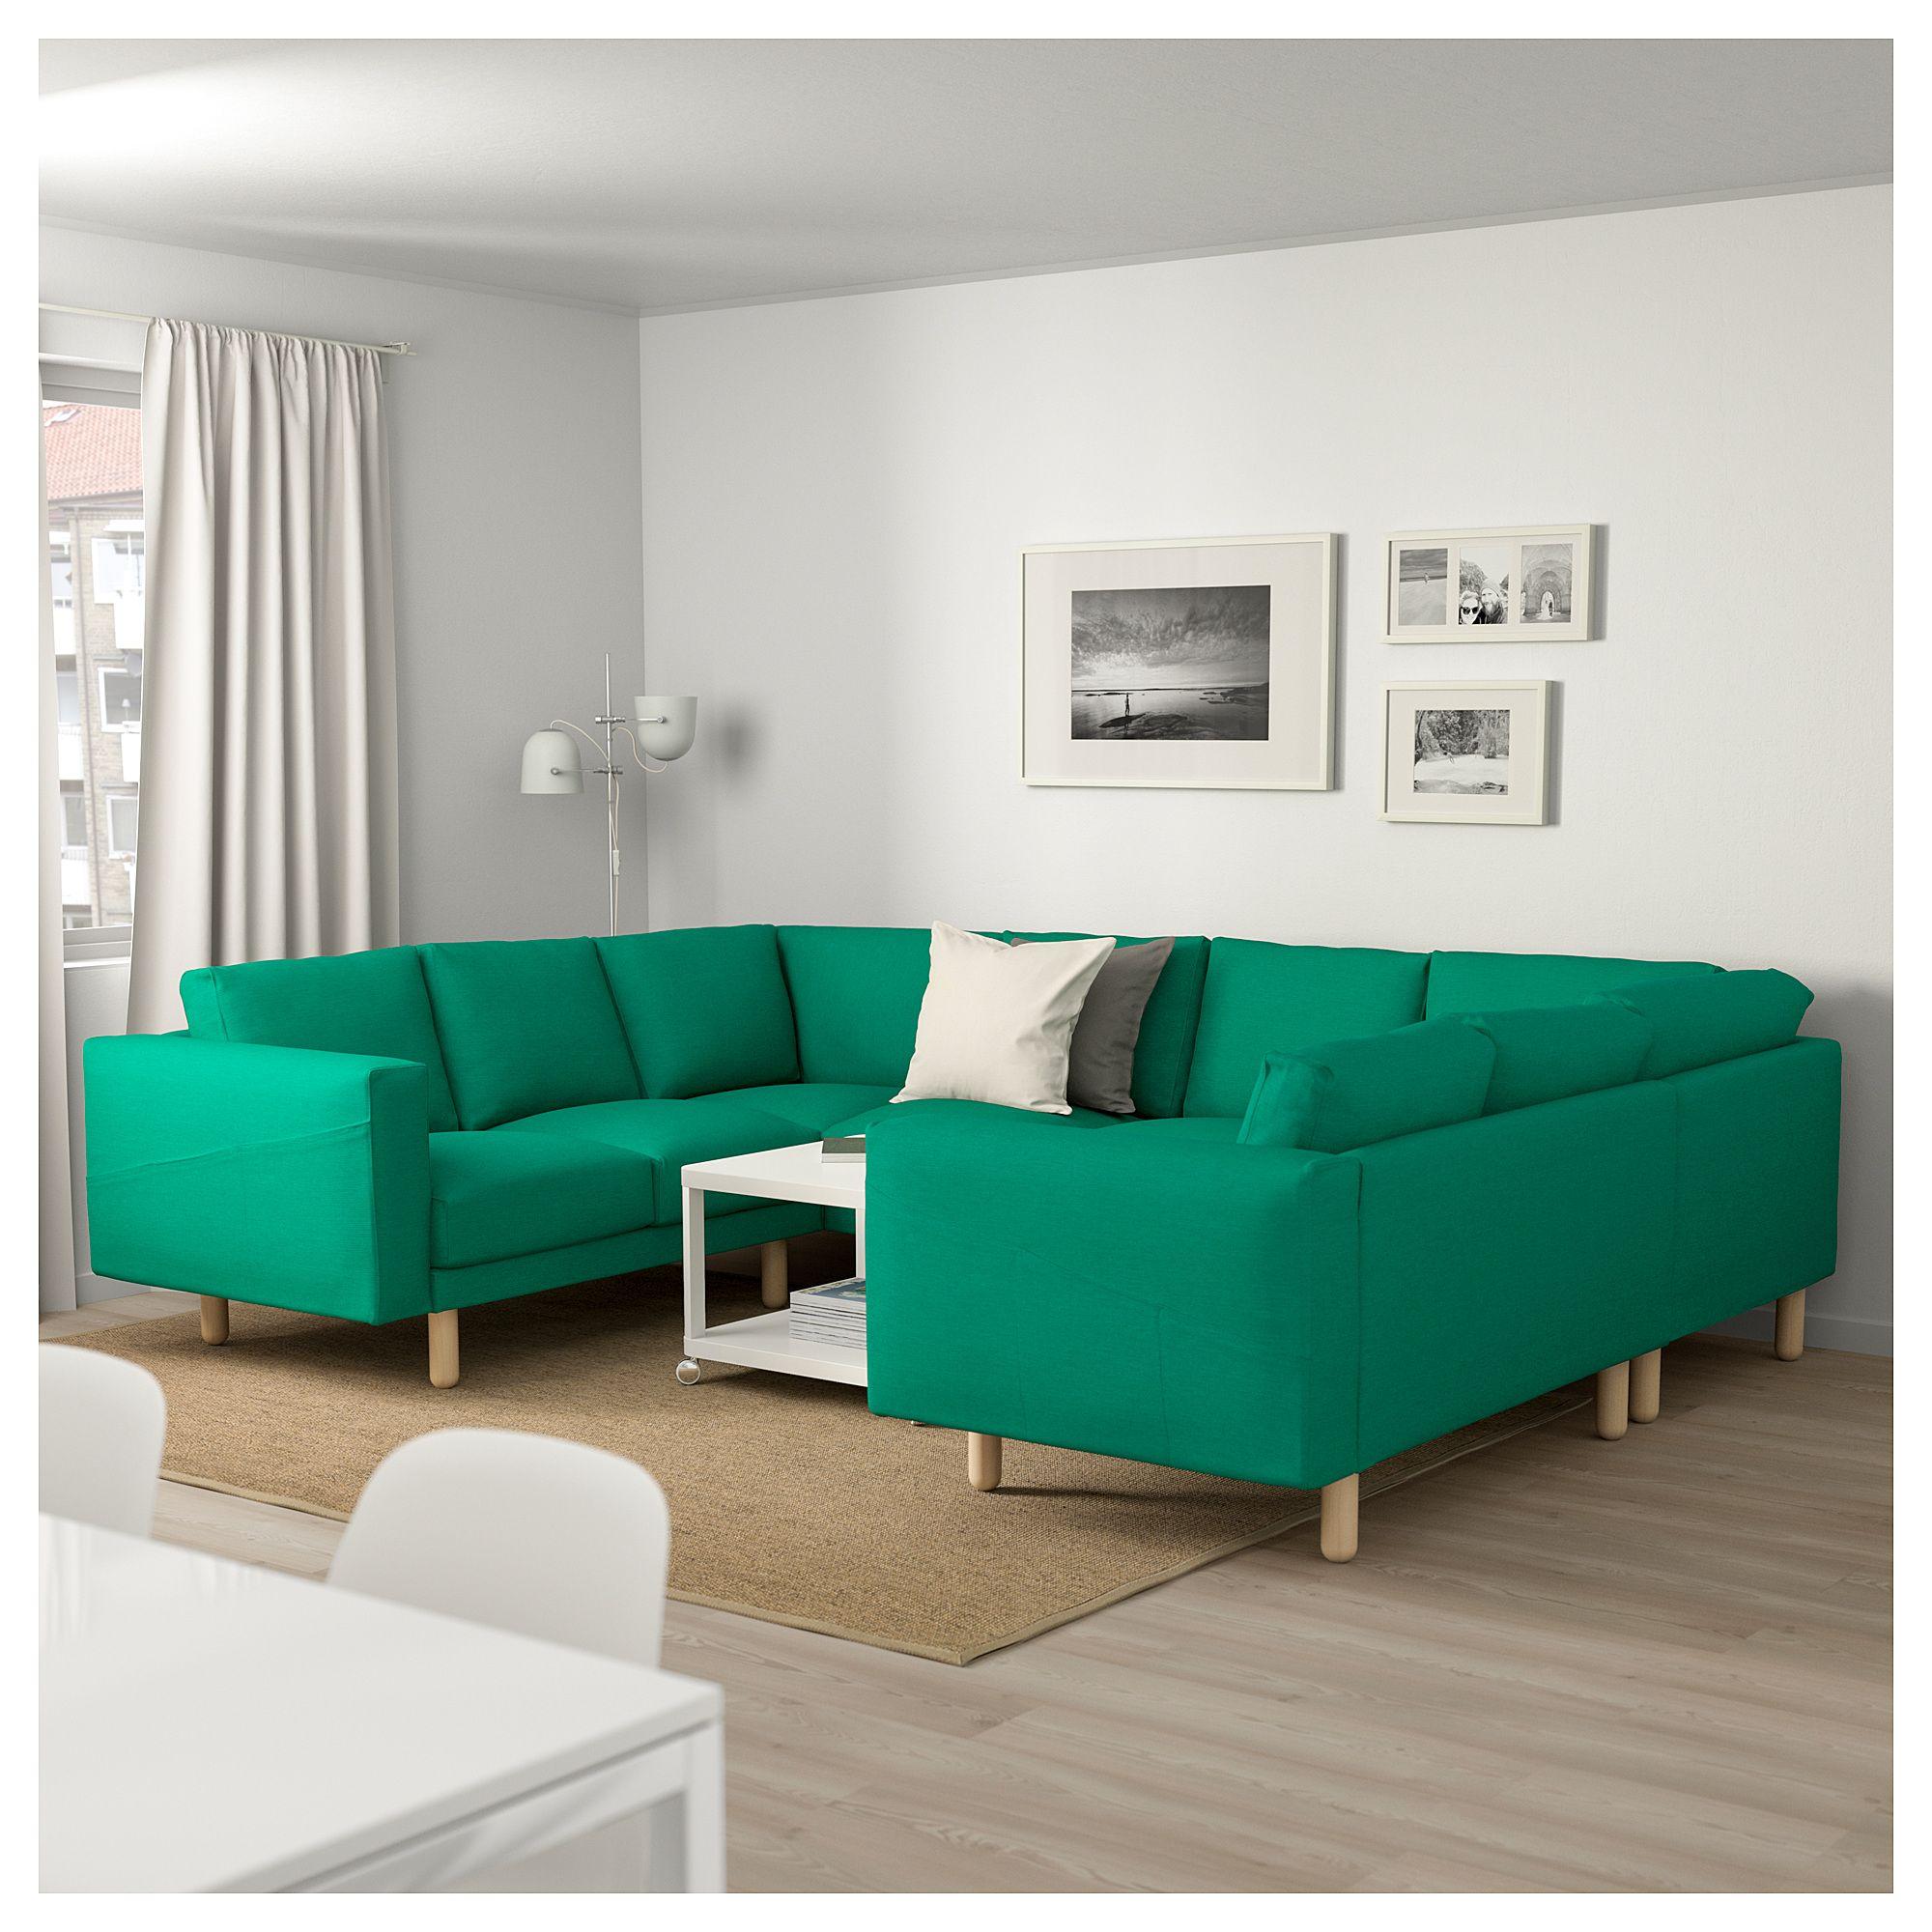 IKEA NORSBORG 8 seat sofa U shaped Edum bright green birch